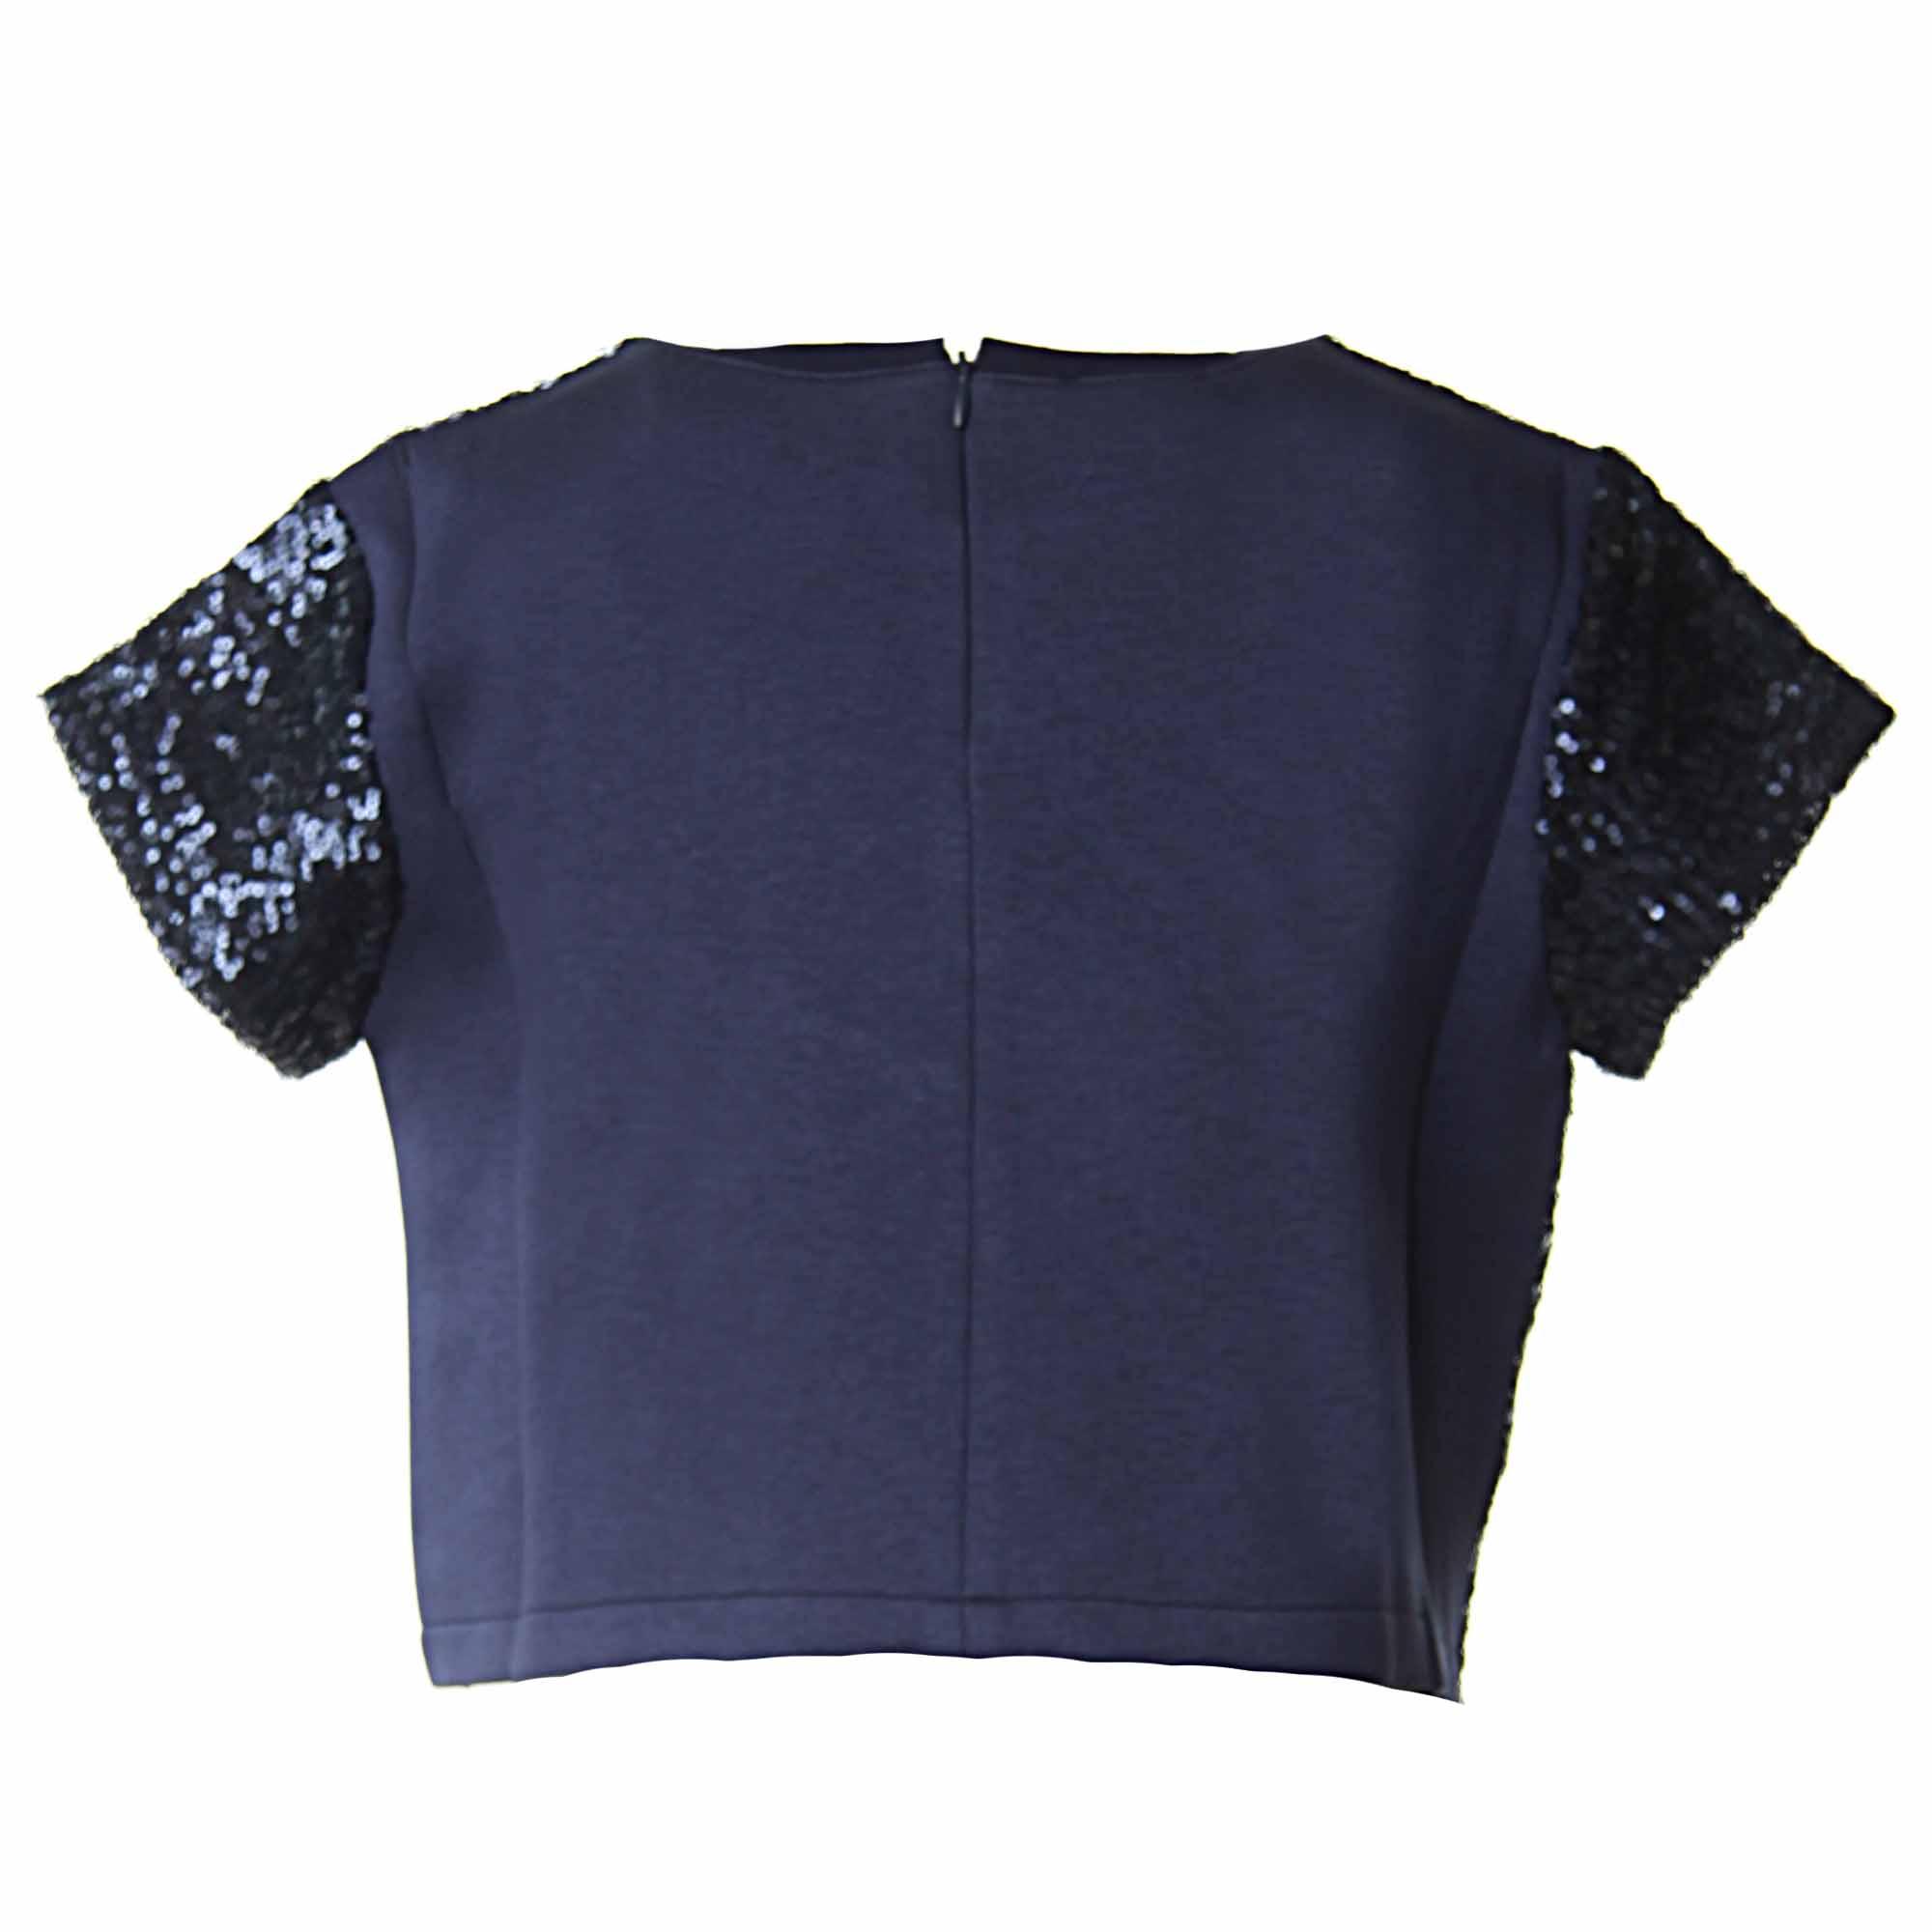 premium selection 4ed4a 3b5eb T-Shirt Bambina Blu Con Paillettes E Stella